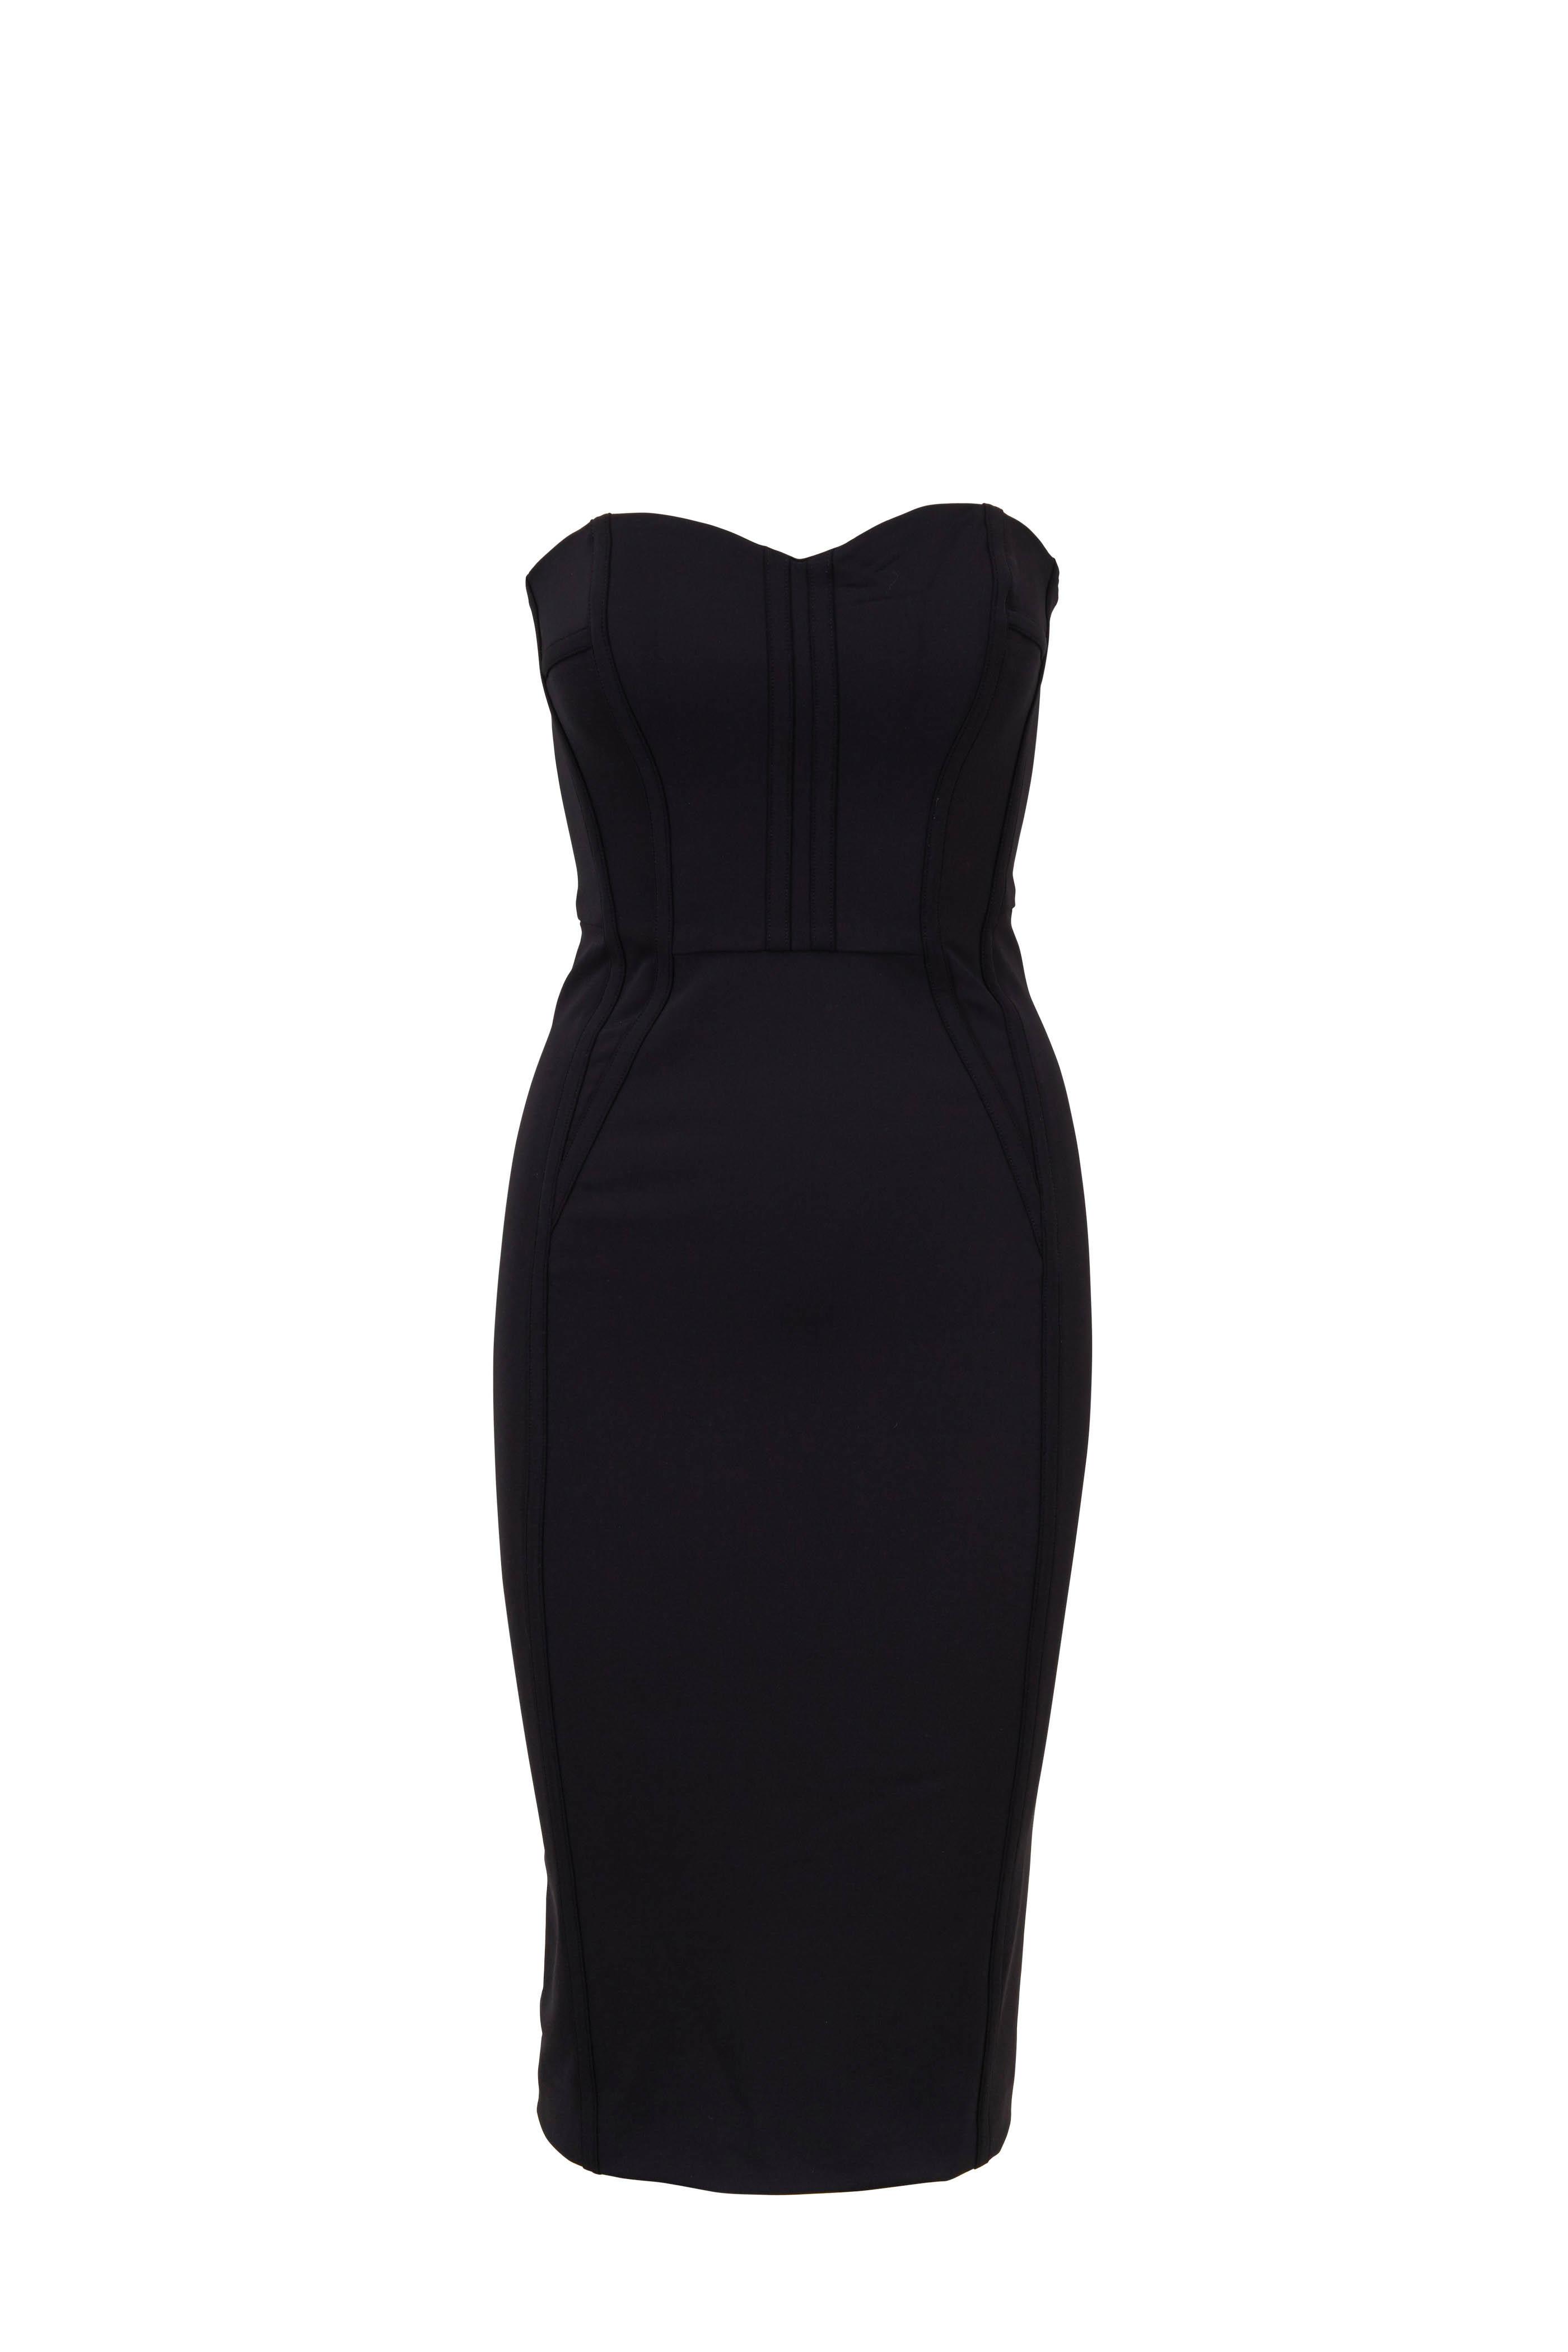 c3e14fe4149 Veronica Beard - Maui Black Strapless Bustier Dress